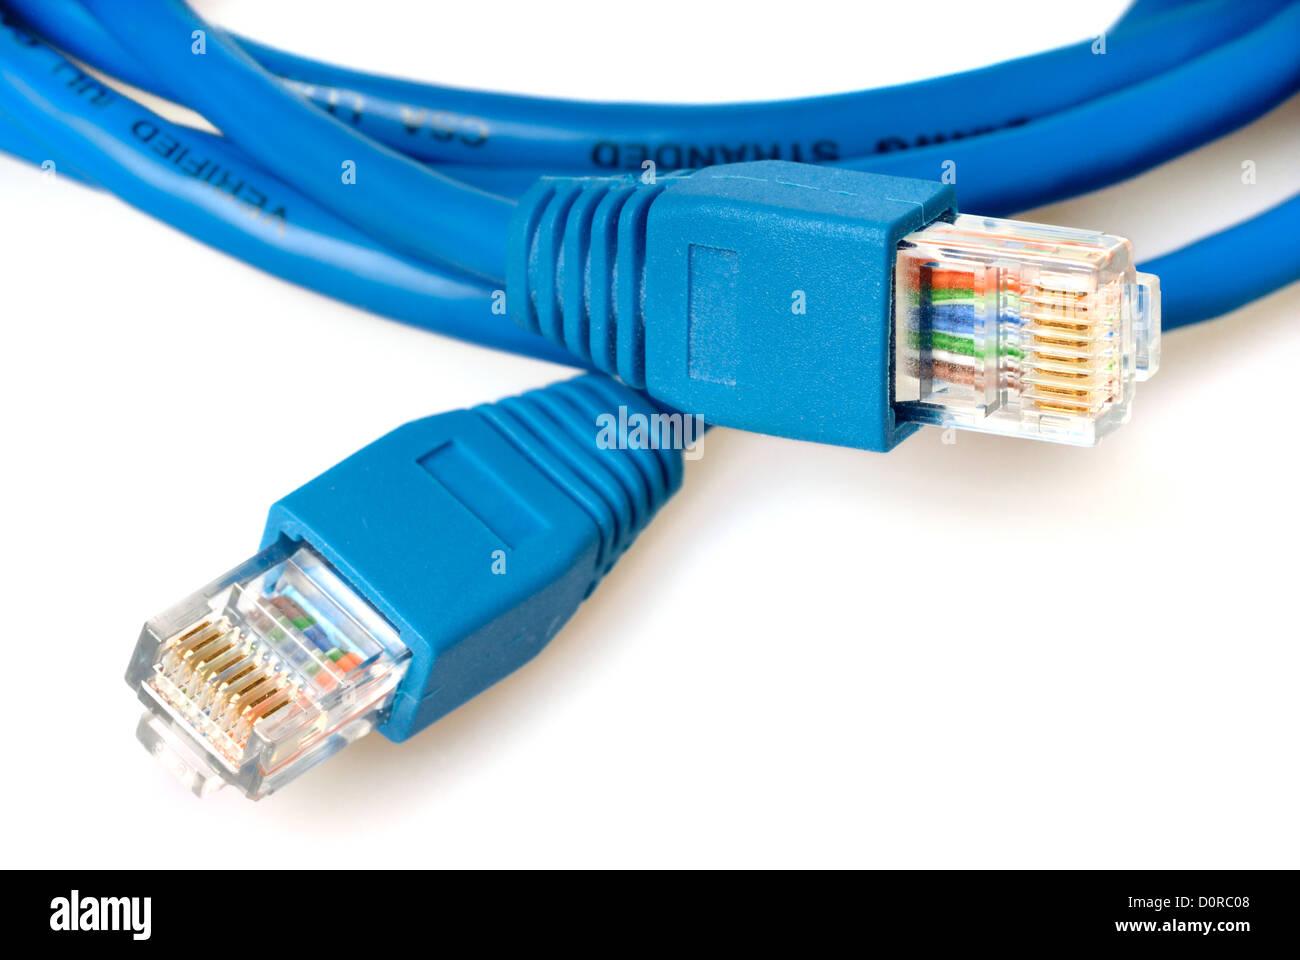 Jacks Serial Ethernet Wiring - Auto Electrical Wiring Diagram •